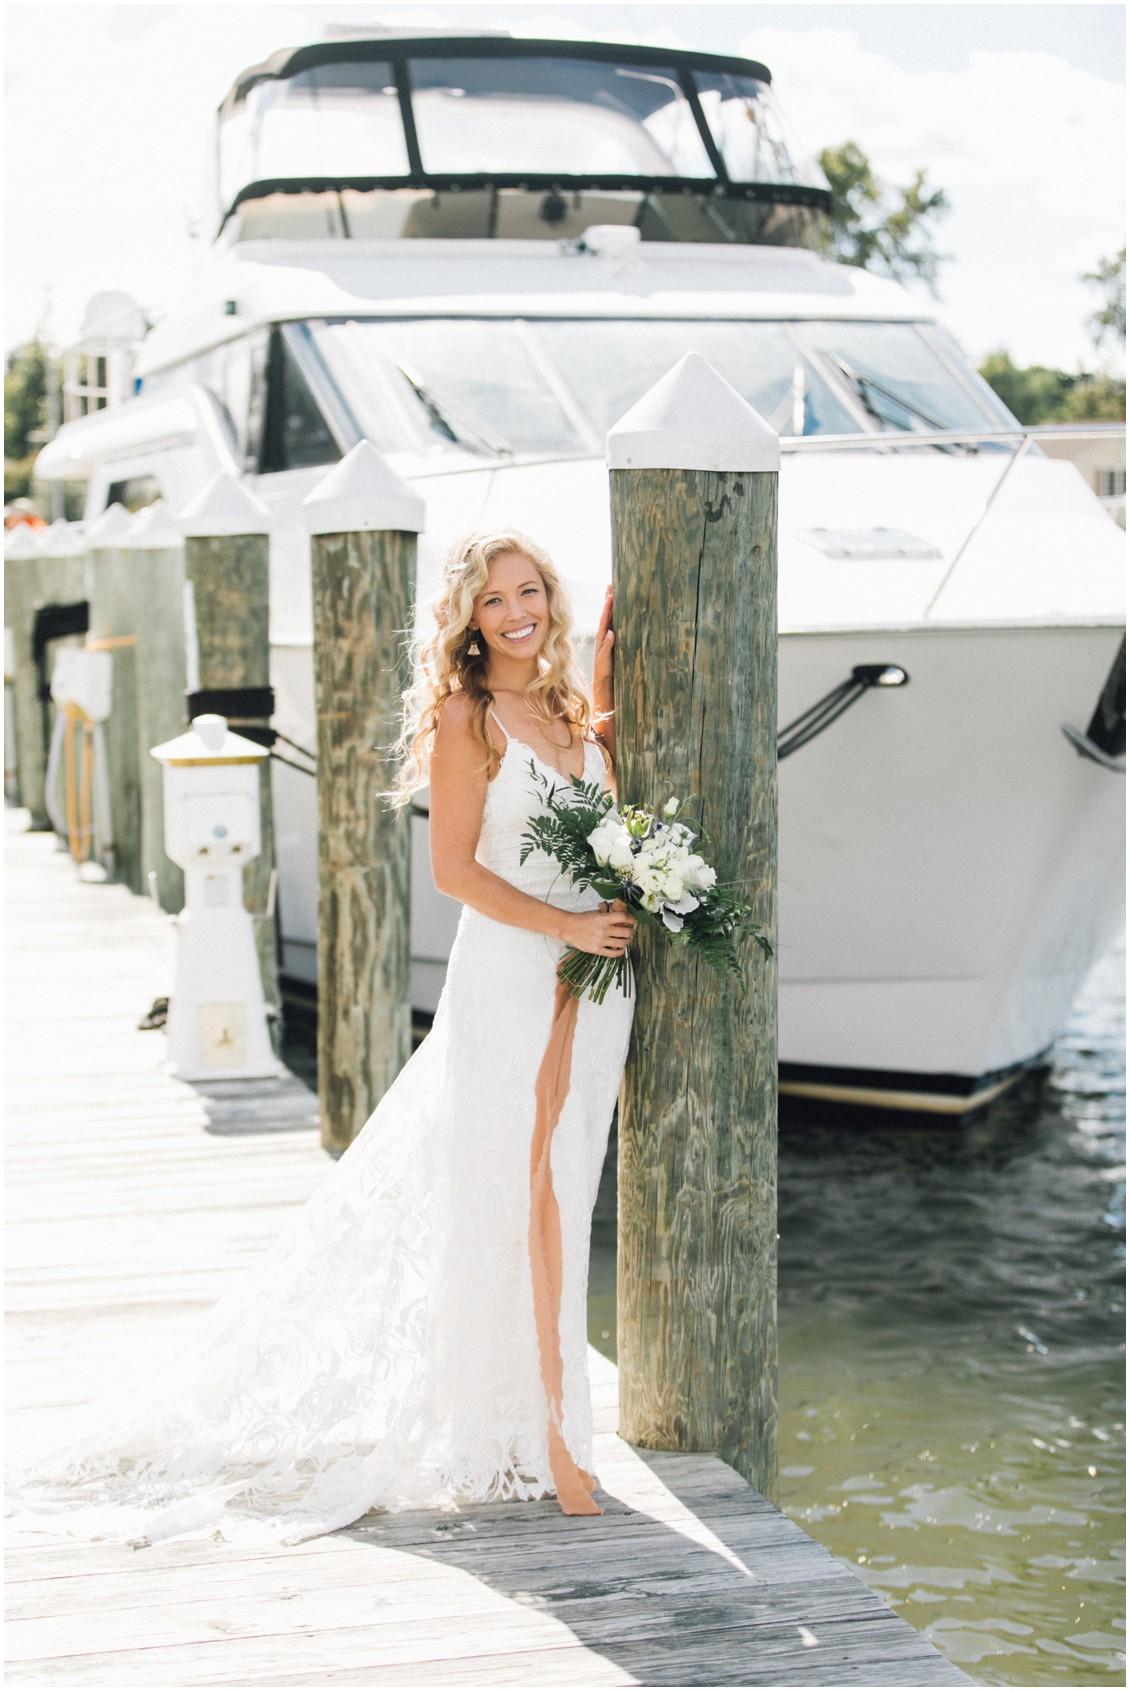 Bridal portrait on dock | My Eastern Shore Wedding | Chesapeake Bay Maritime Museum